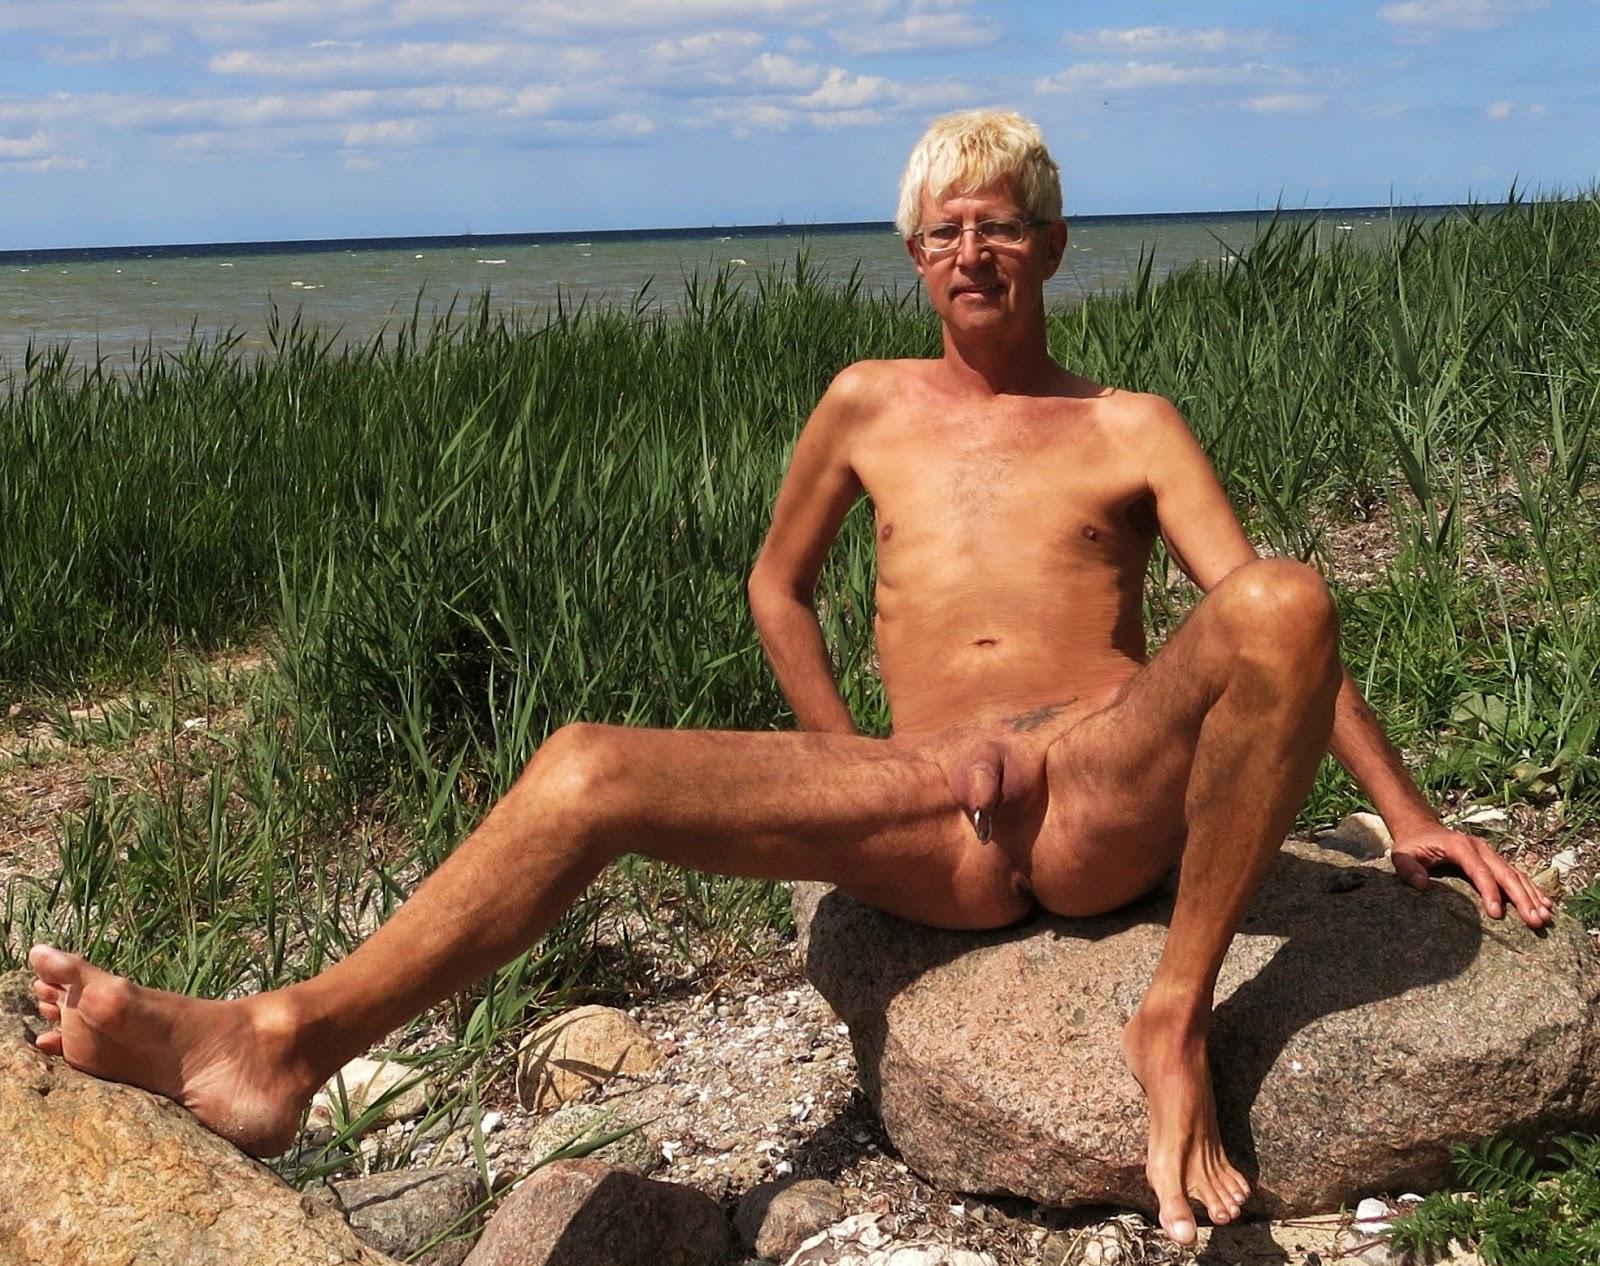 svenska gratis porrfilmer presentkort massage stockholm